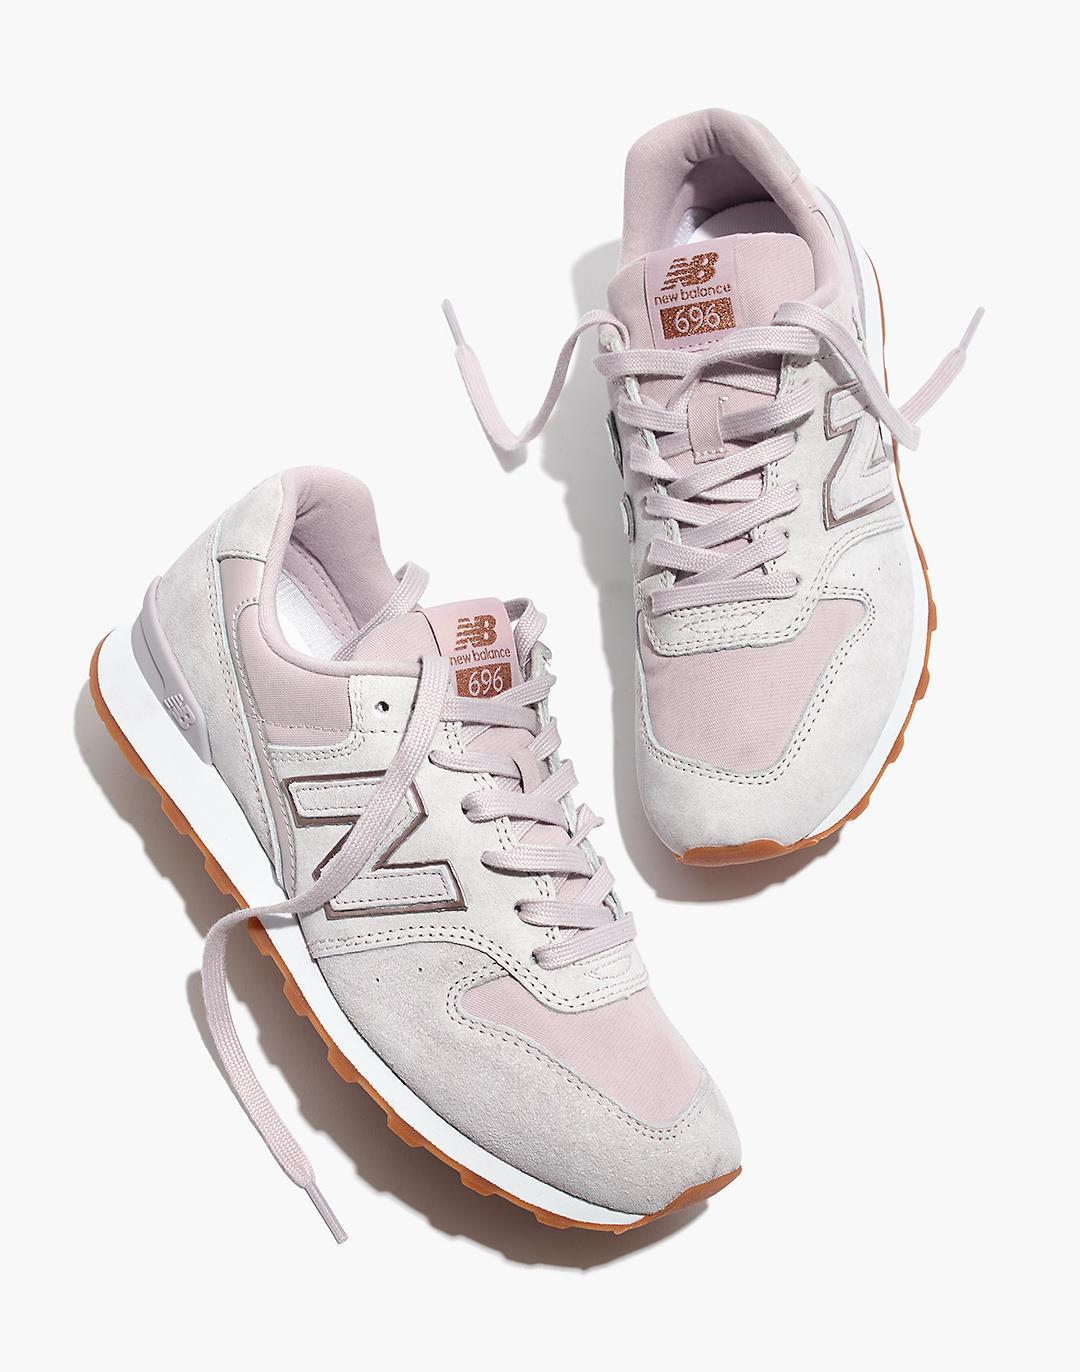 New Balance® 696 Runner Sneakers | Cute